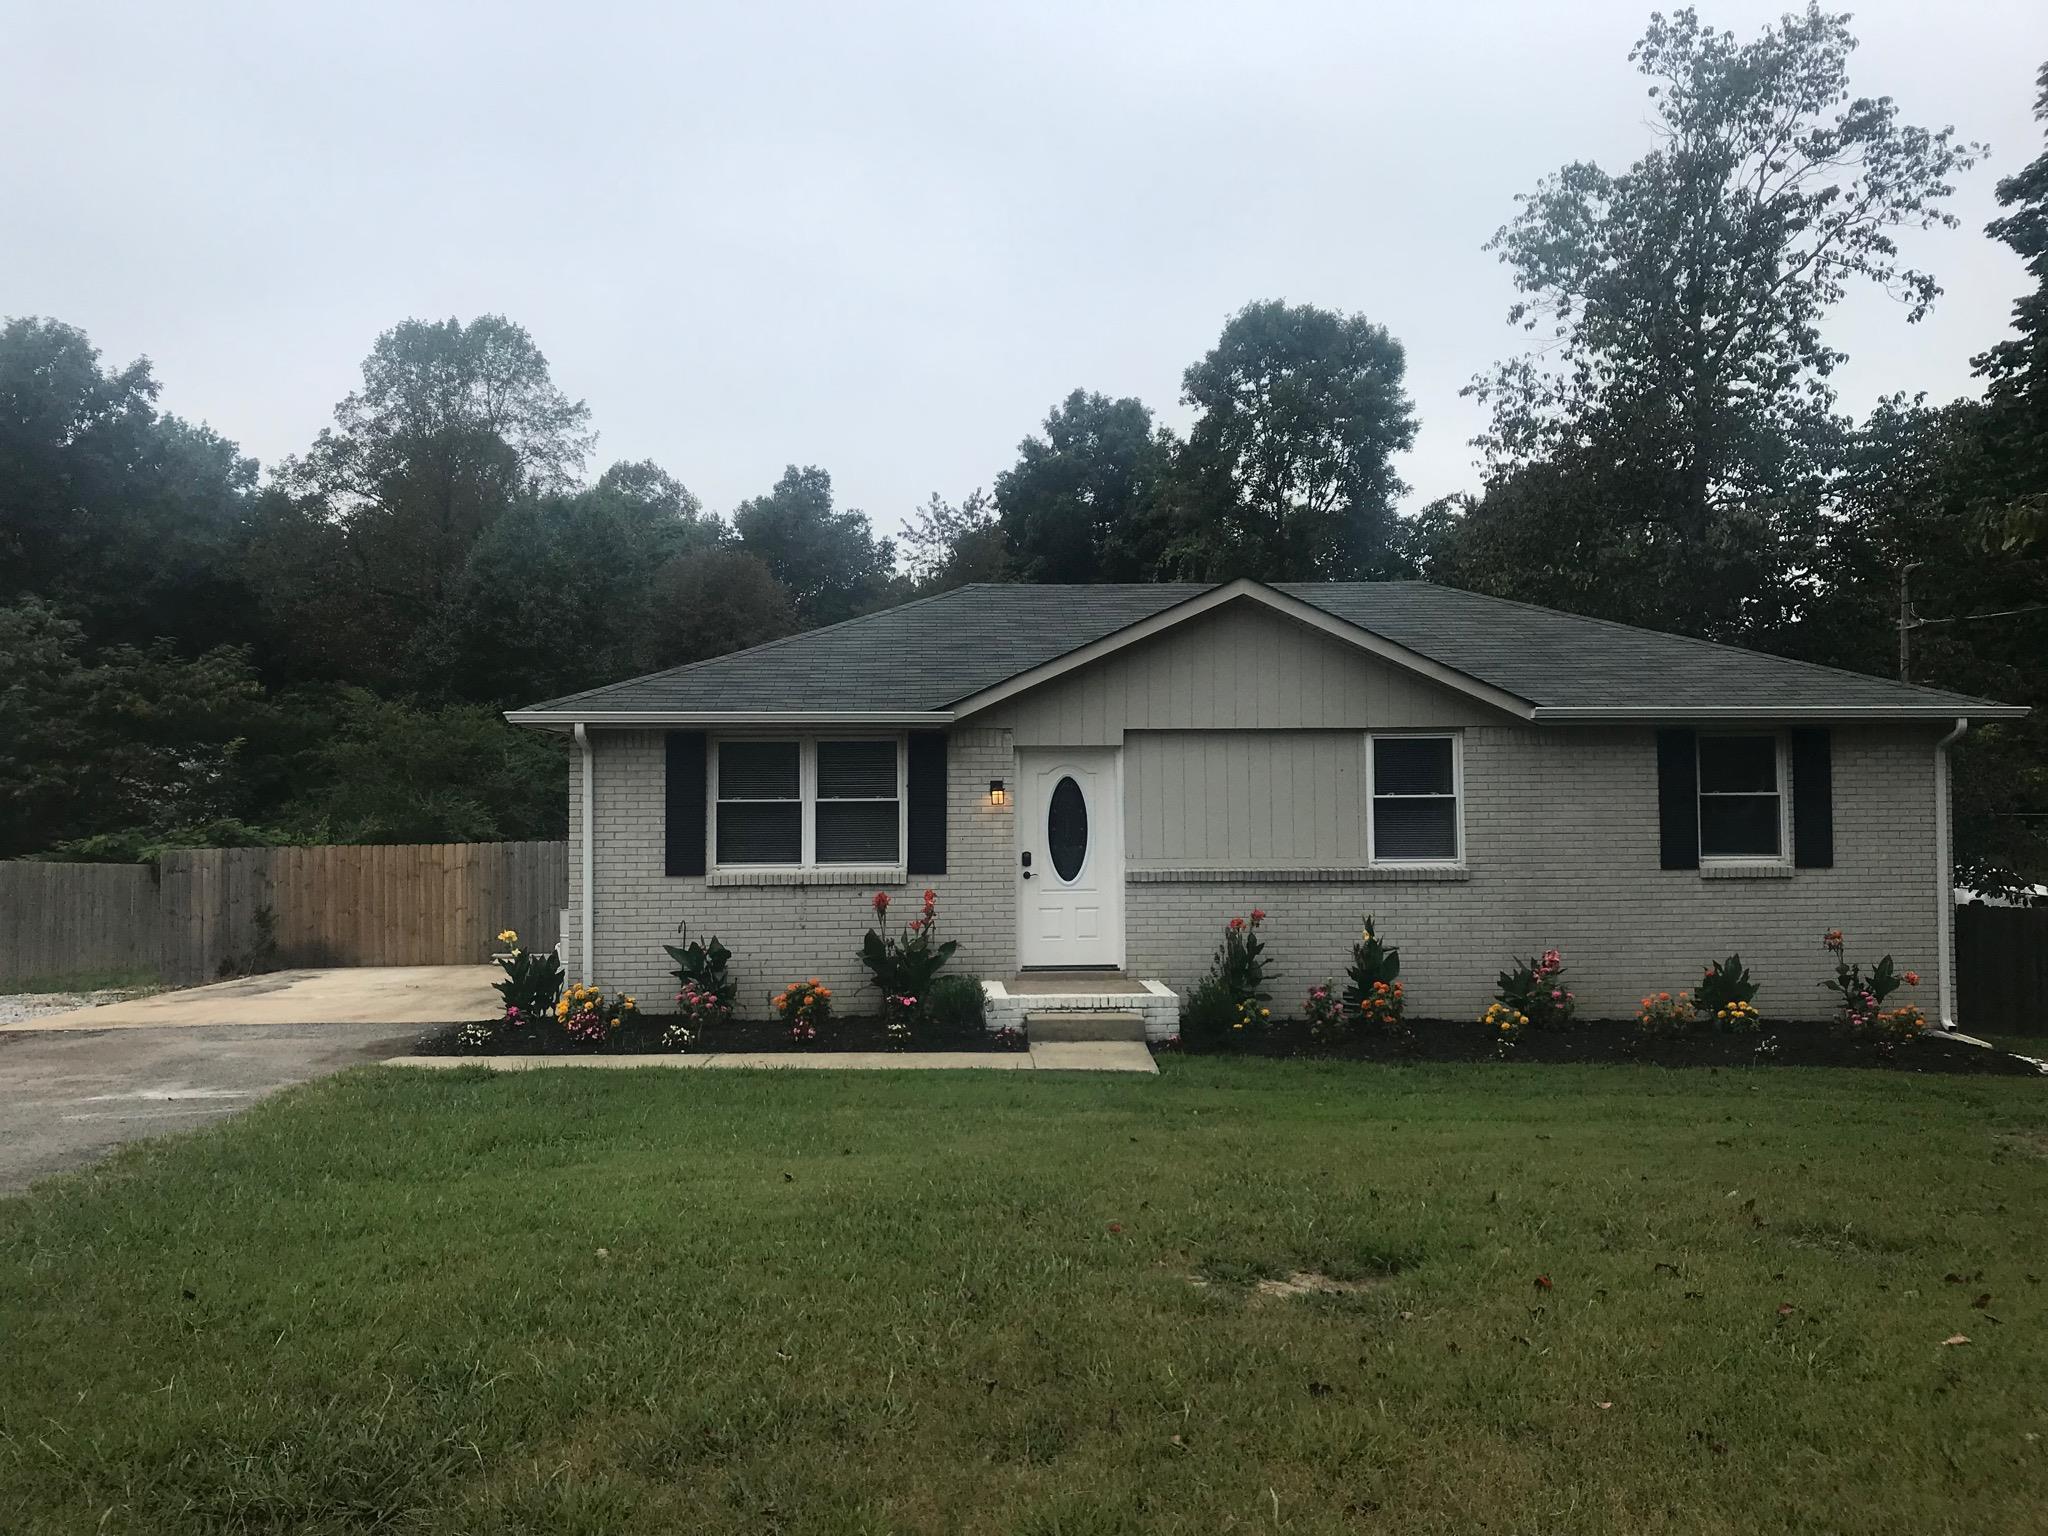 7220 Birchbark Dr, Fairview in Williamson County County, TN 37062 Home for Sale